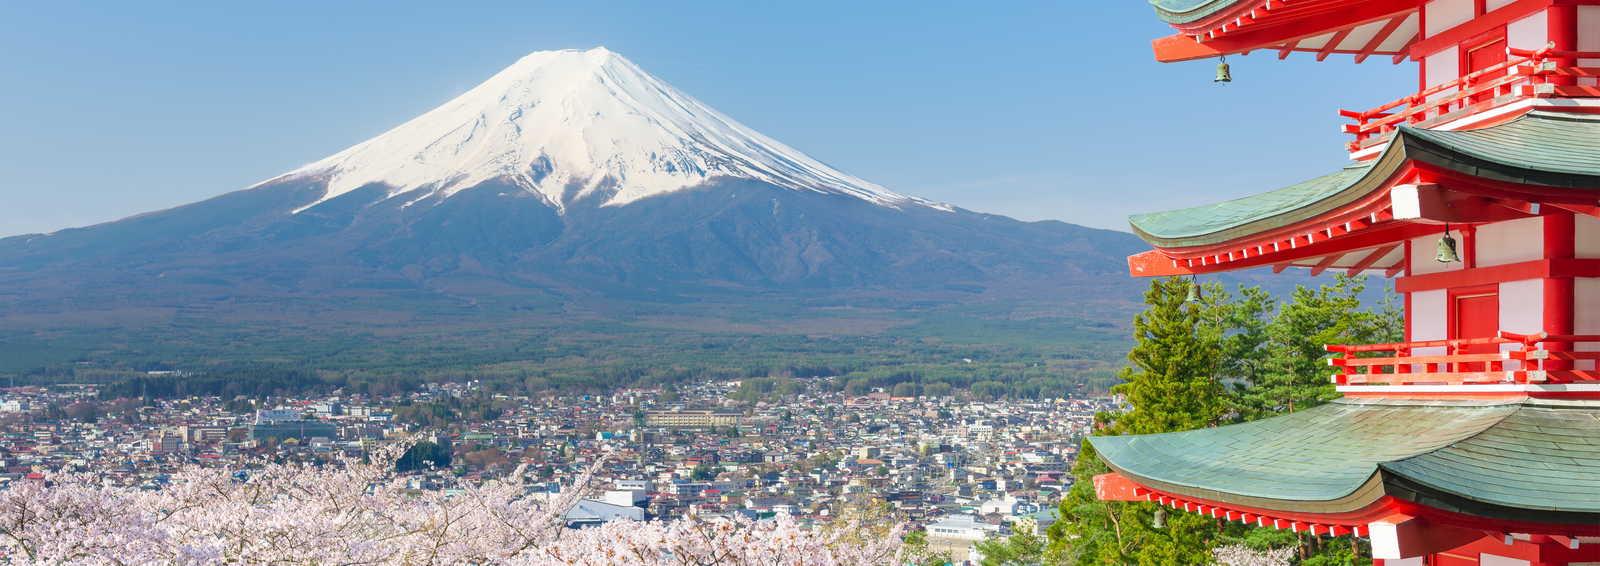 Red pagoda near Mt. Fuji, Japan